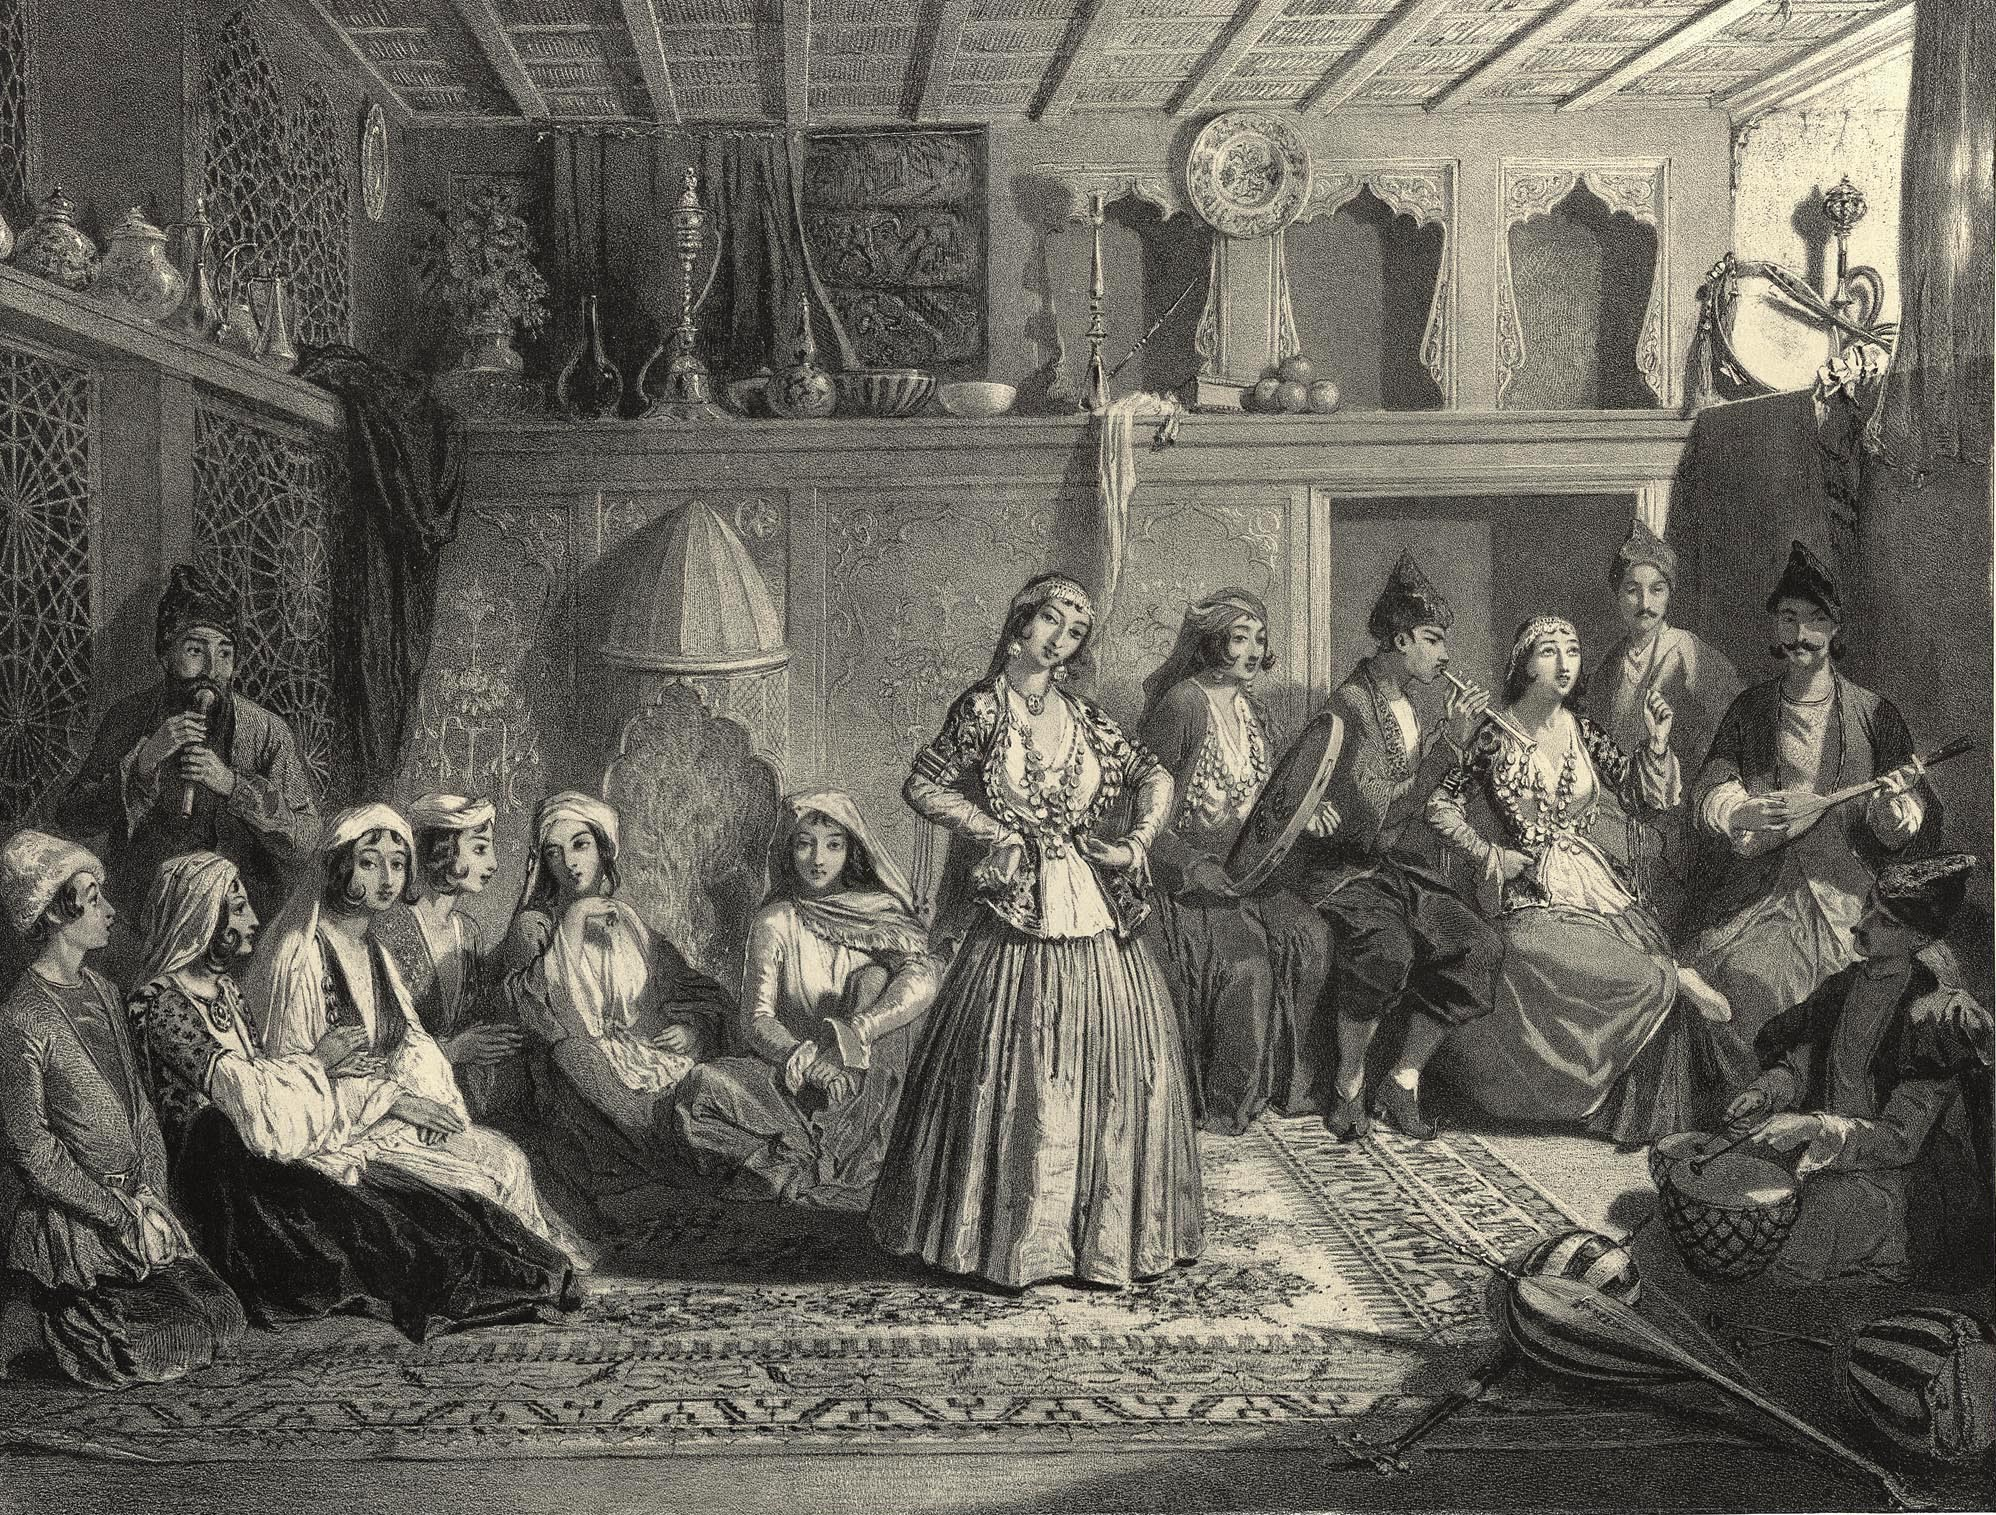 41. Chirvan. Bayaderes de Chemakha / Ширван. Баядерки из Шамахы